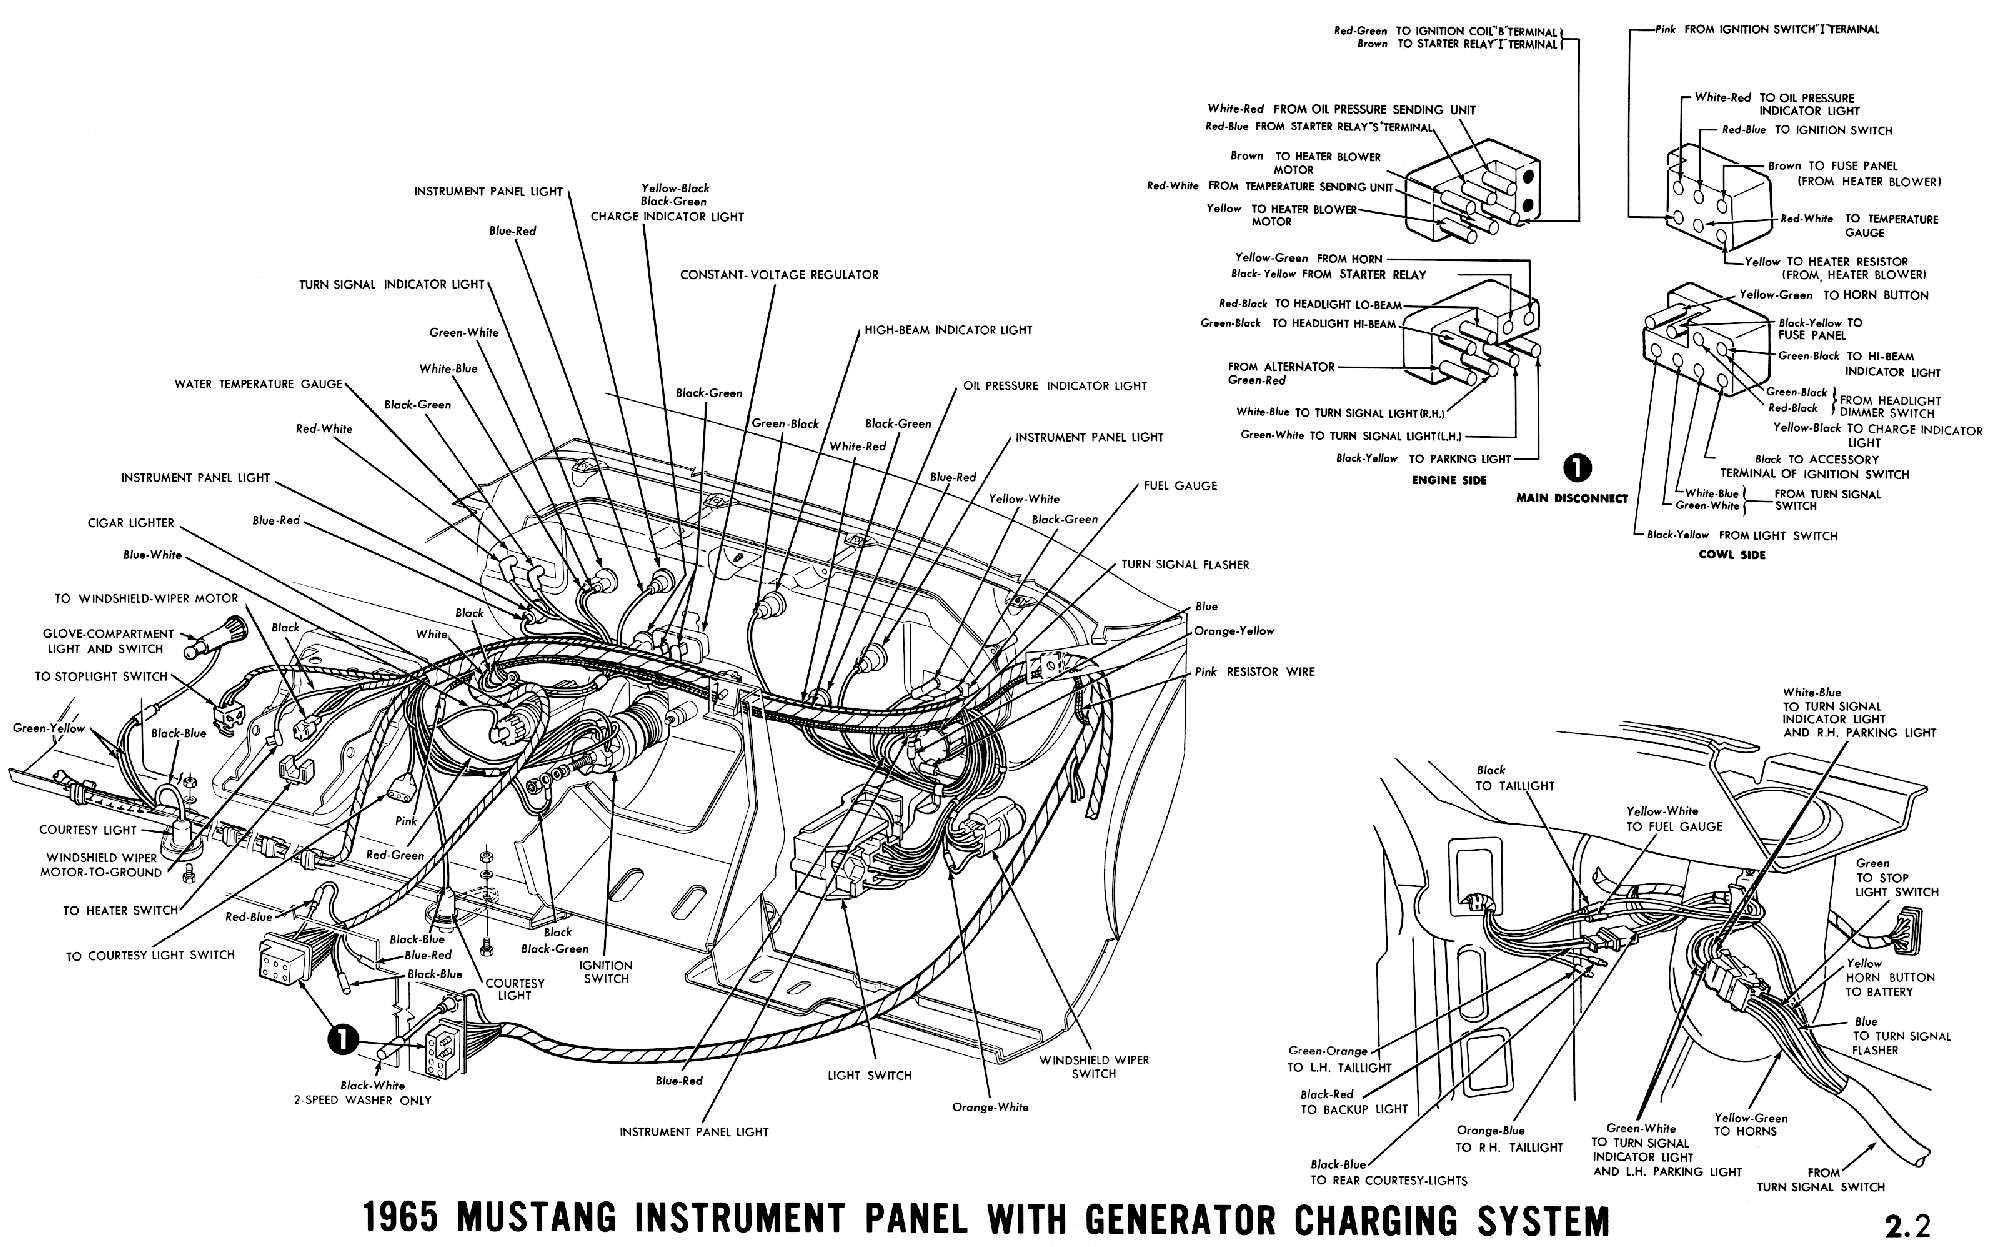 Terrific 1965 Mustang Wiring Diagrams Average Joe Restoration Wiring Cloud Staixaidewilluminateatxorg